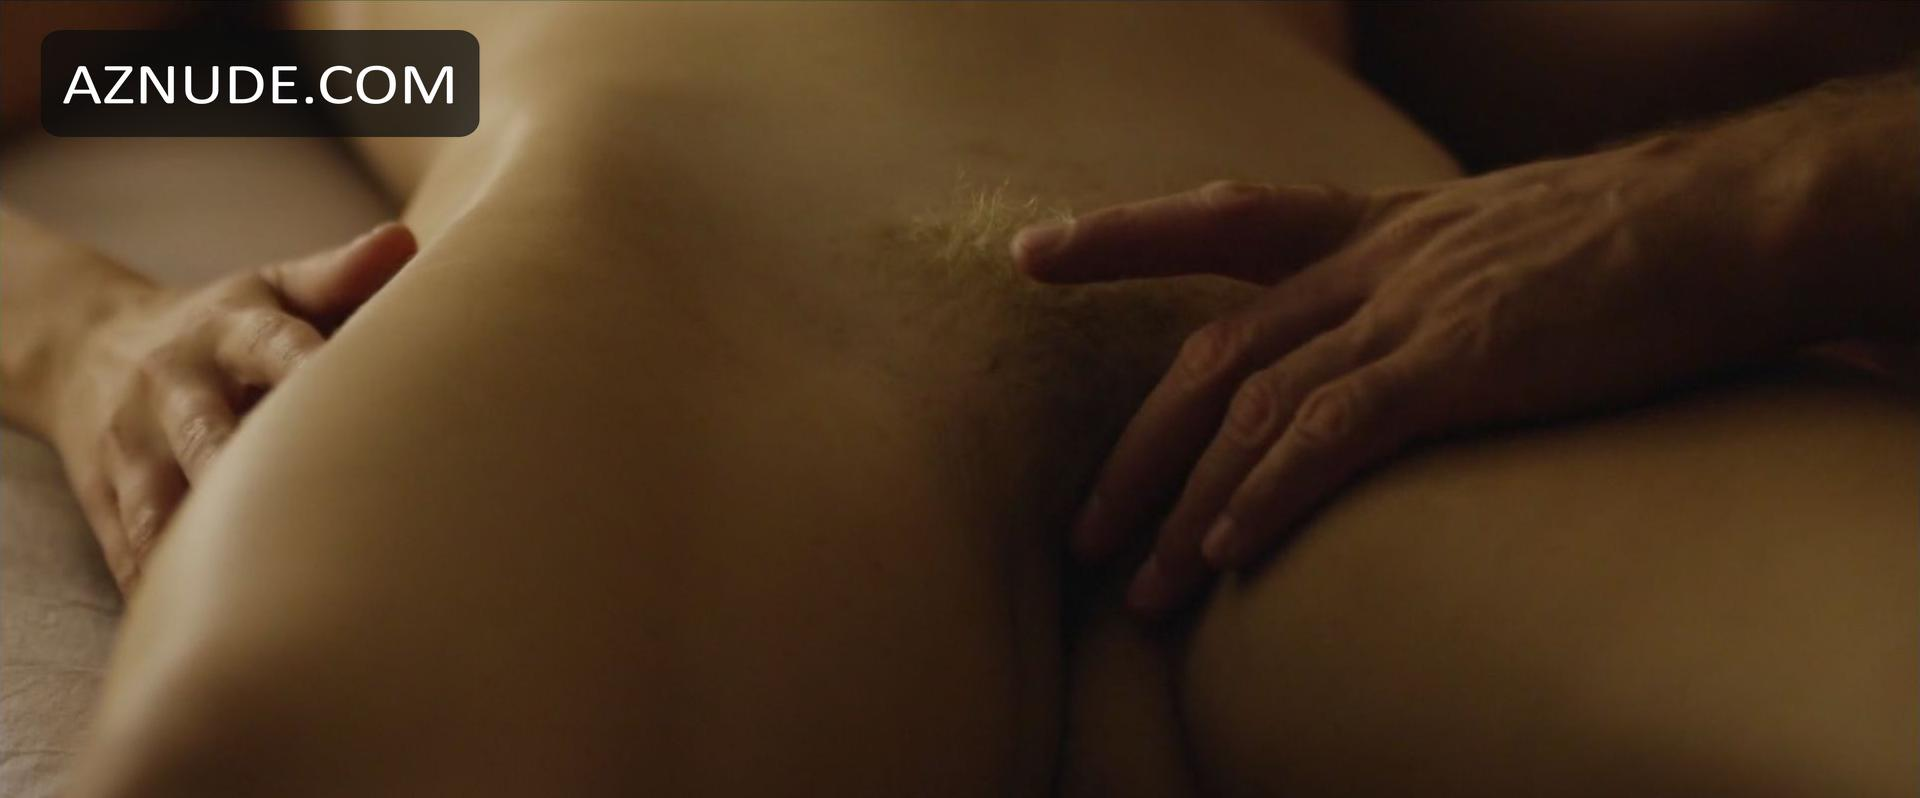 Alison brie nude sex scene scandalplanetcom 8